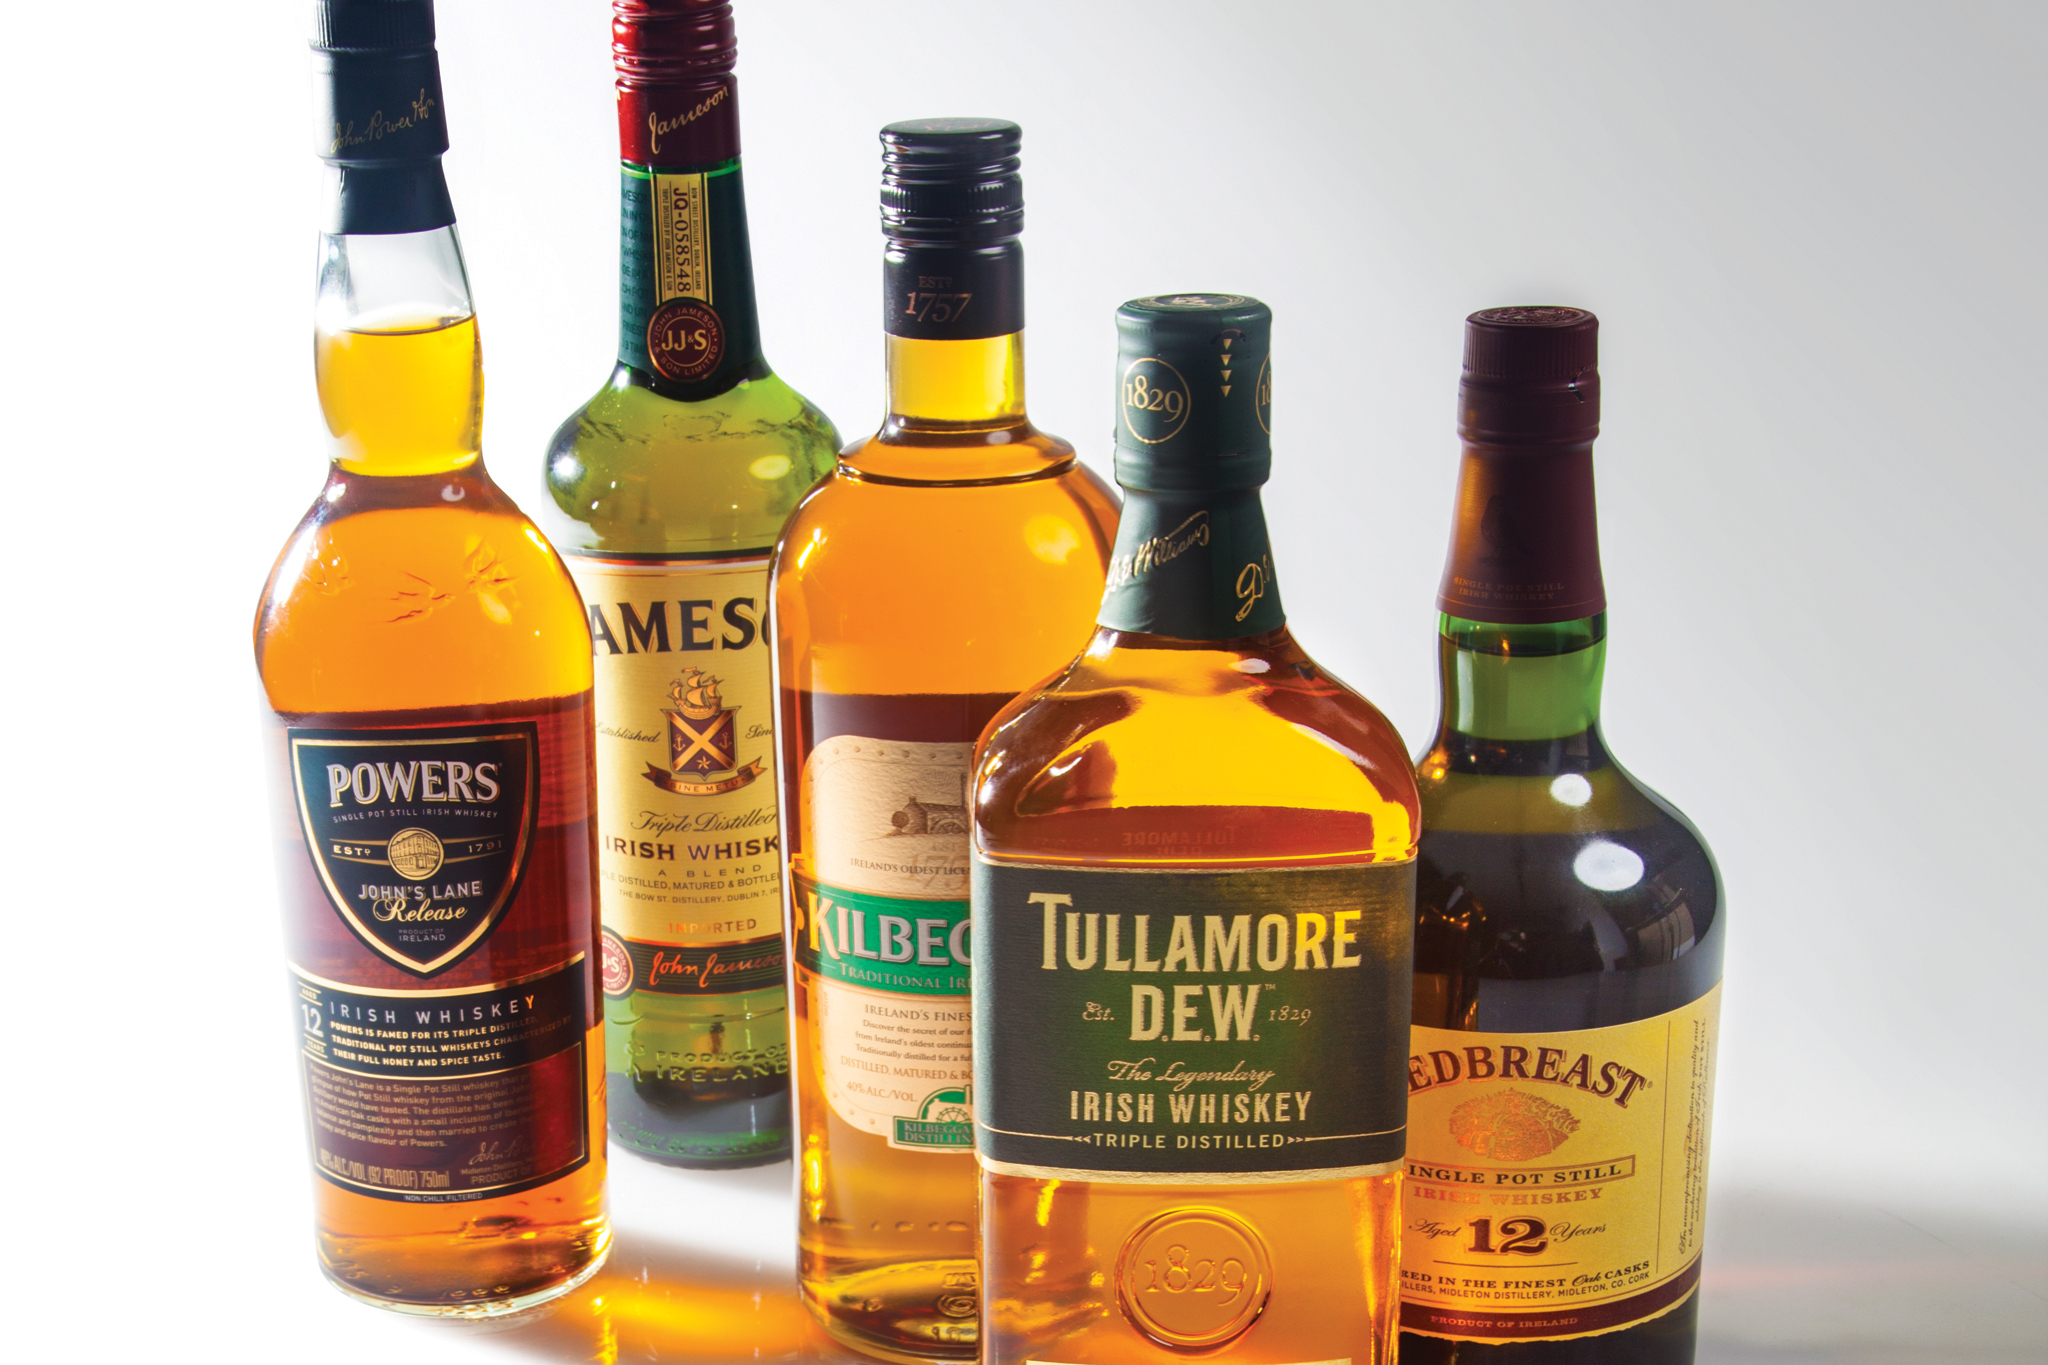 The 10 best Irish whiskey bottles